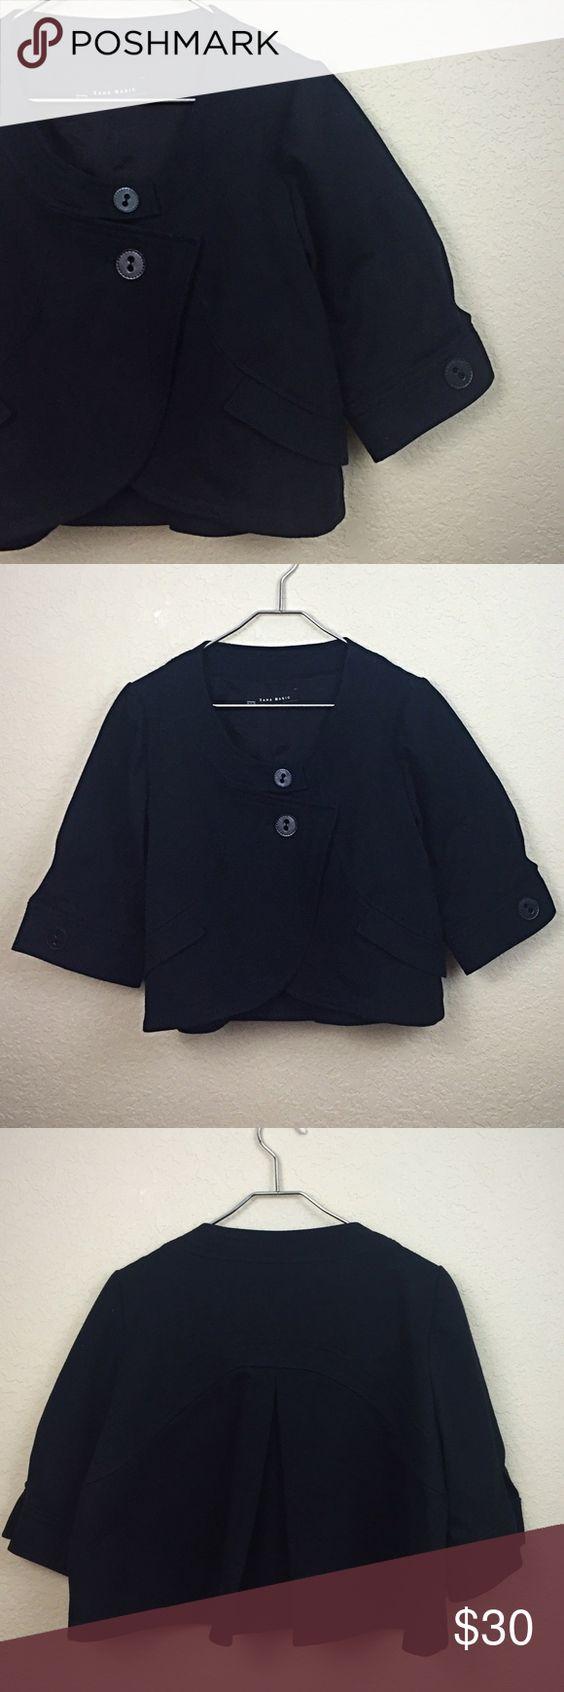 Zara jacket Zara black crop jacket size xl like new no damages $70 Zara Jackets & Coats